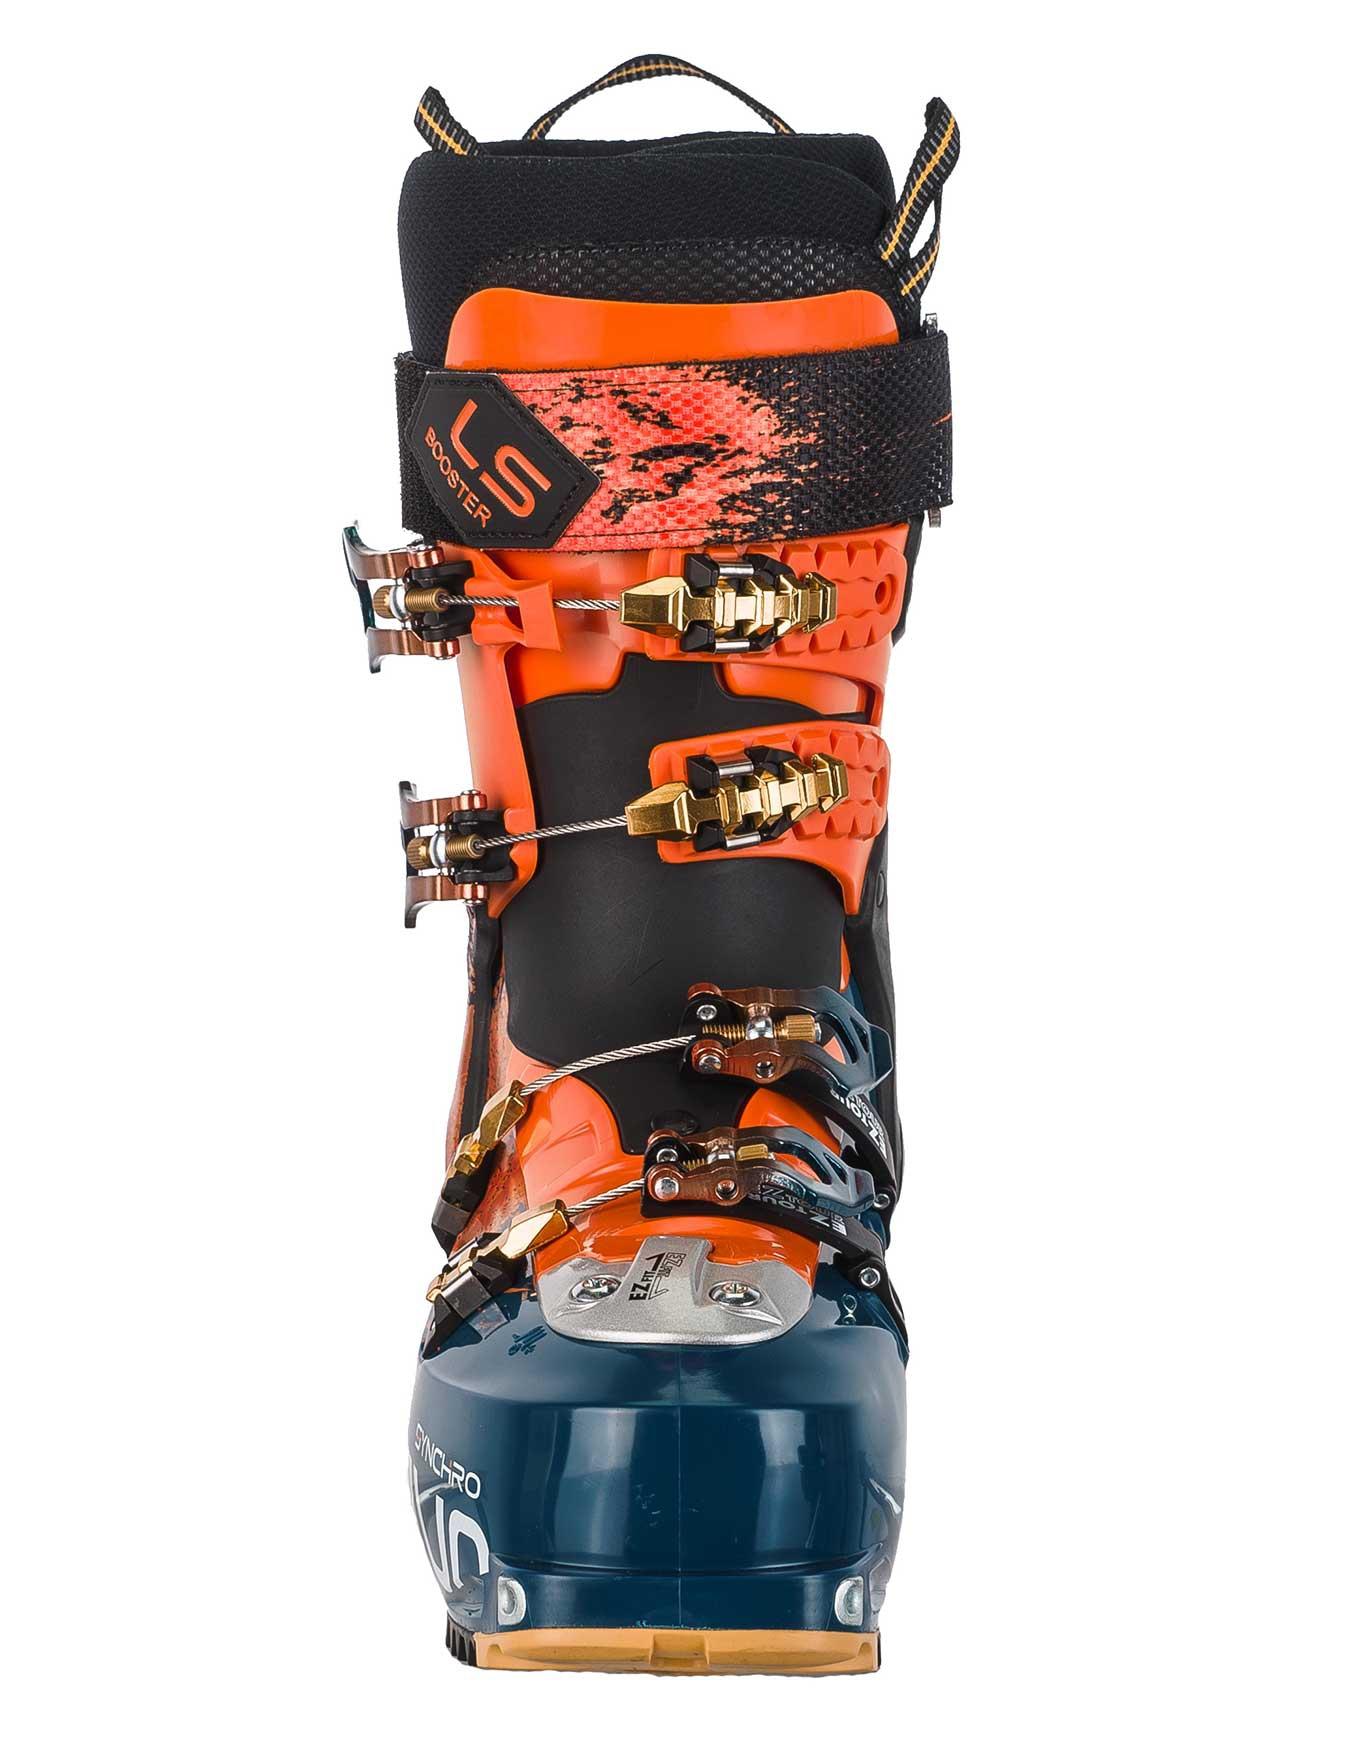 Salomon Quoi Taille C'est Ski 315 Chaussures WD2YeH9EI